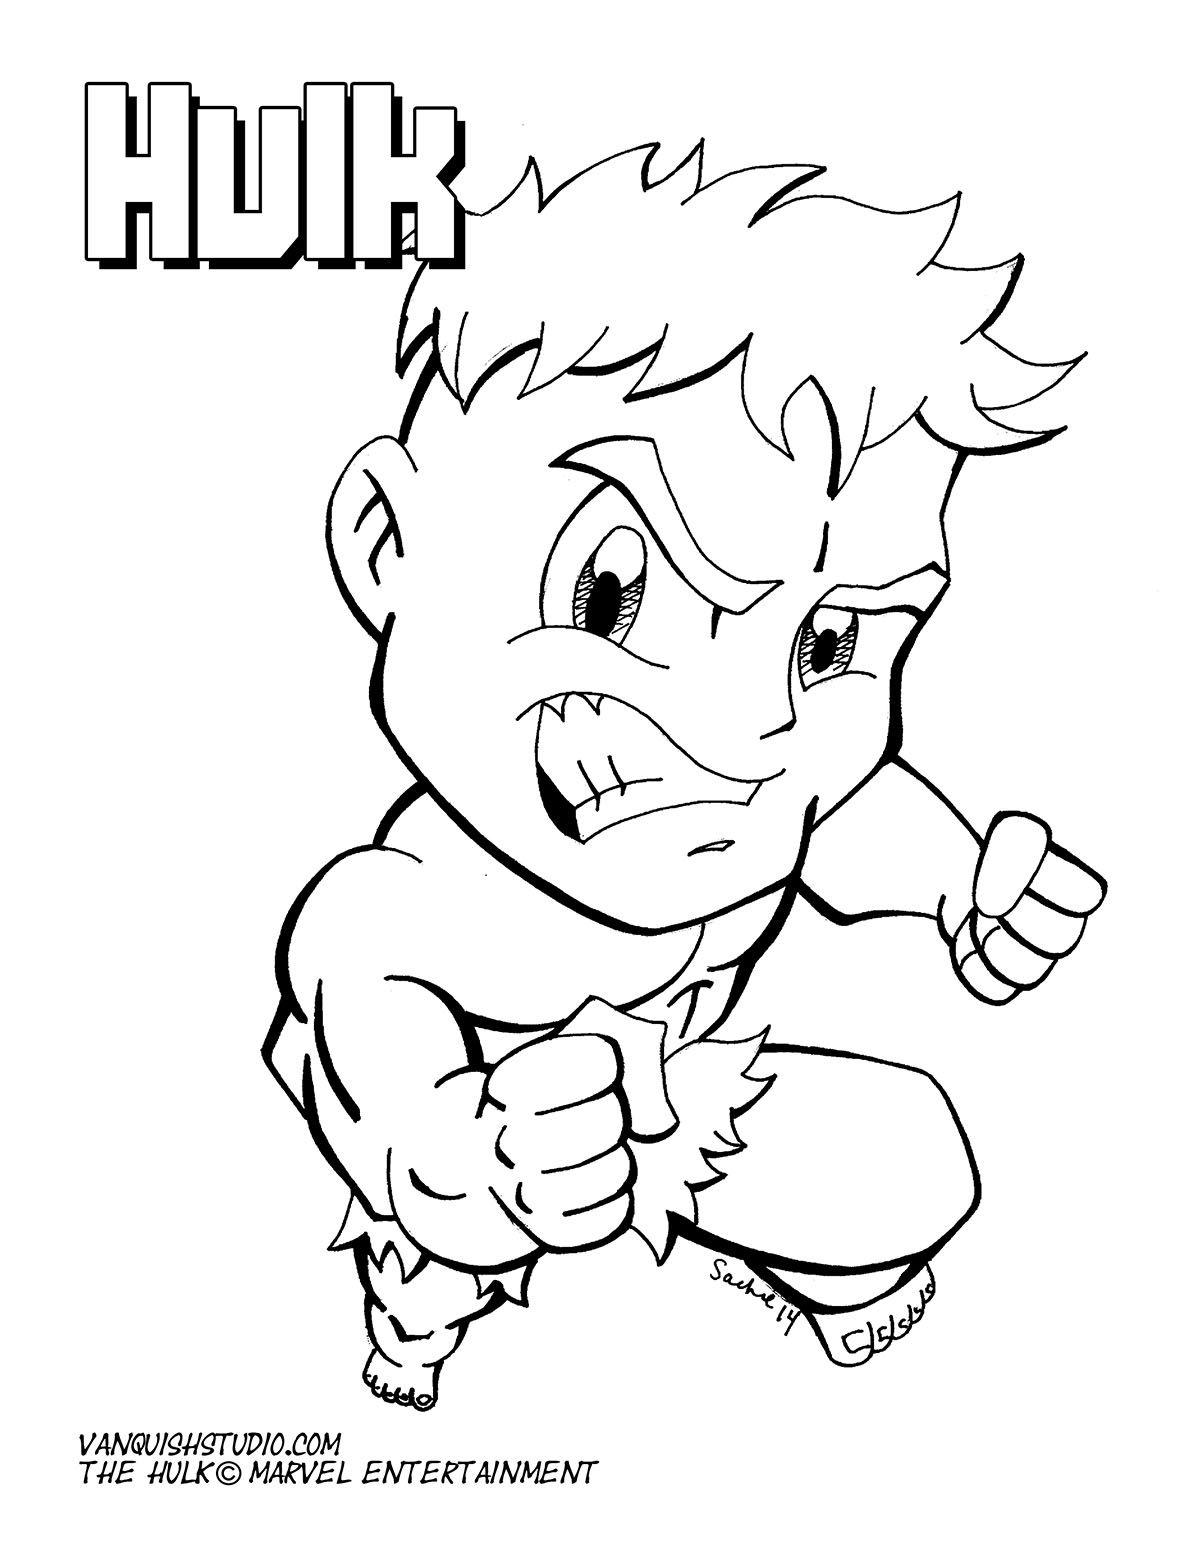 Coloring Pages Incredible Hulk | Hulk coloring pages, Cartoon ... | 1553x1200